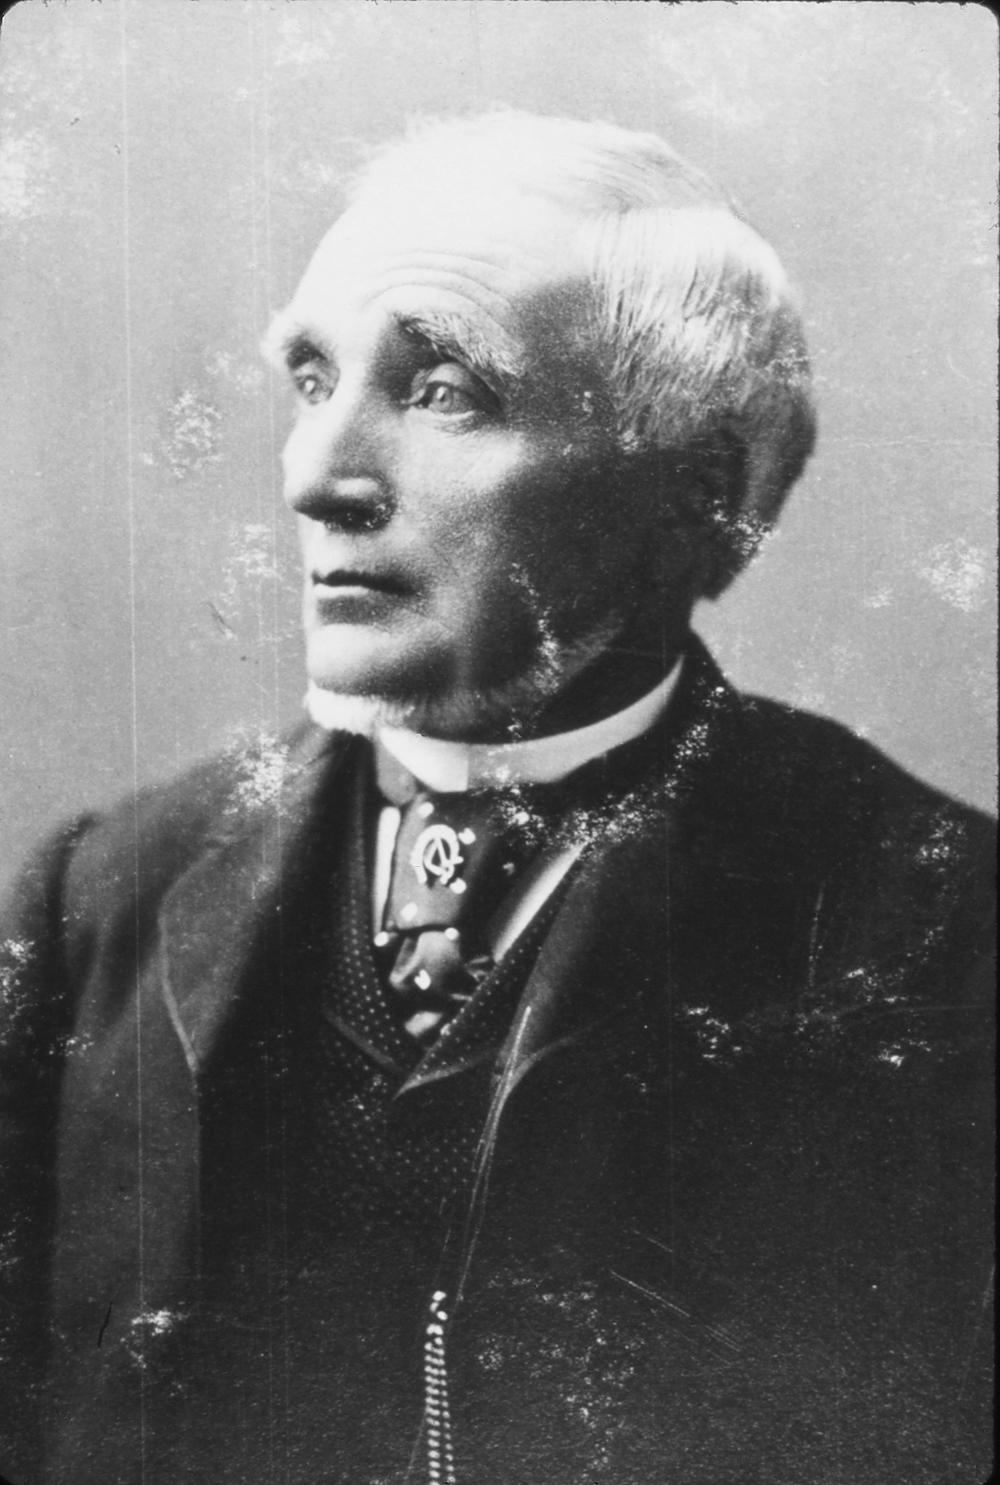 Robert Dunsmuir